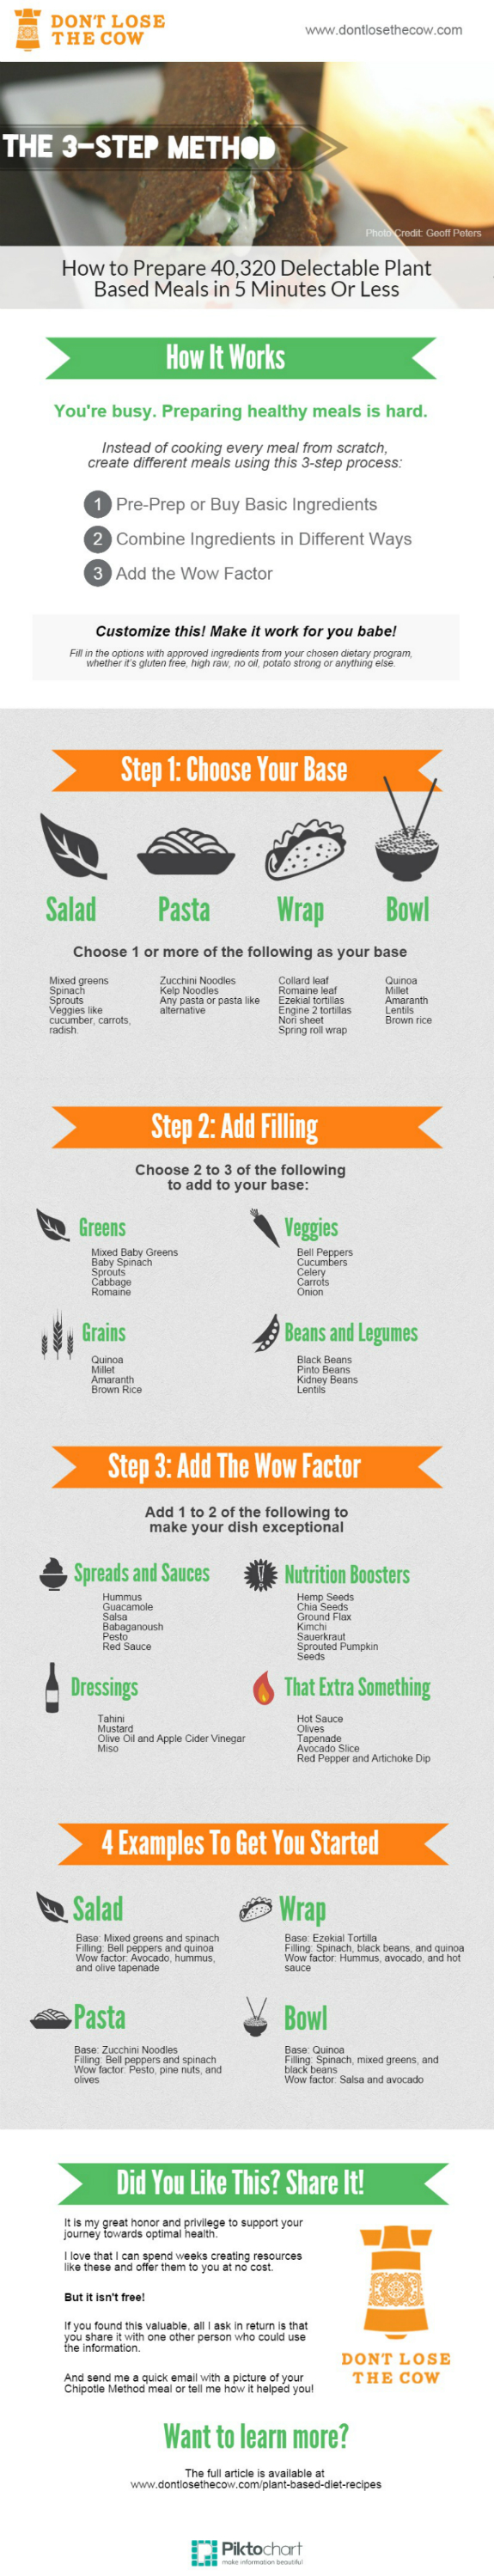 3-step method for preparing healthy plant-based meals